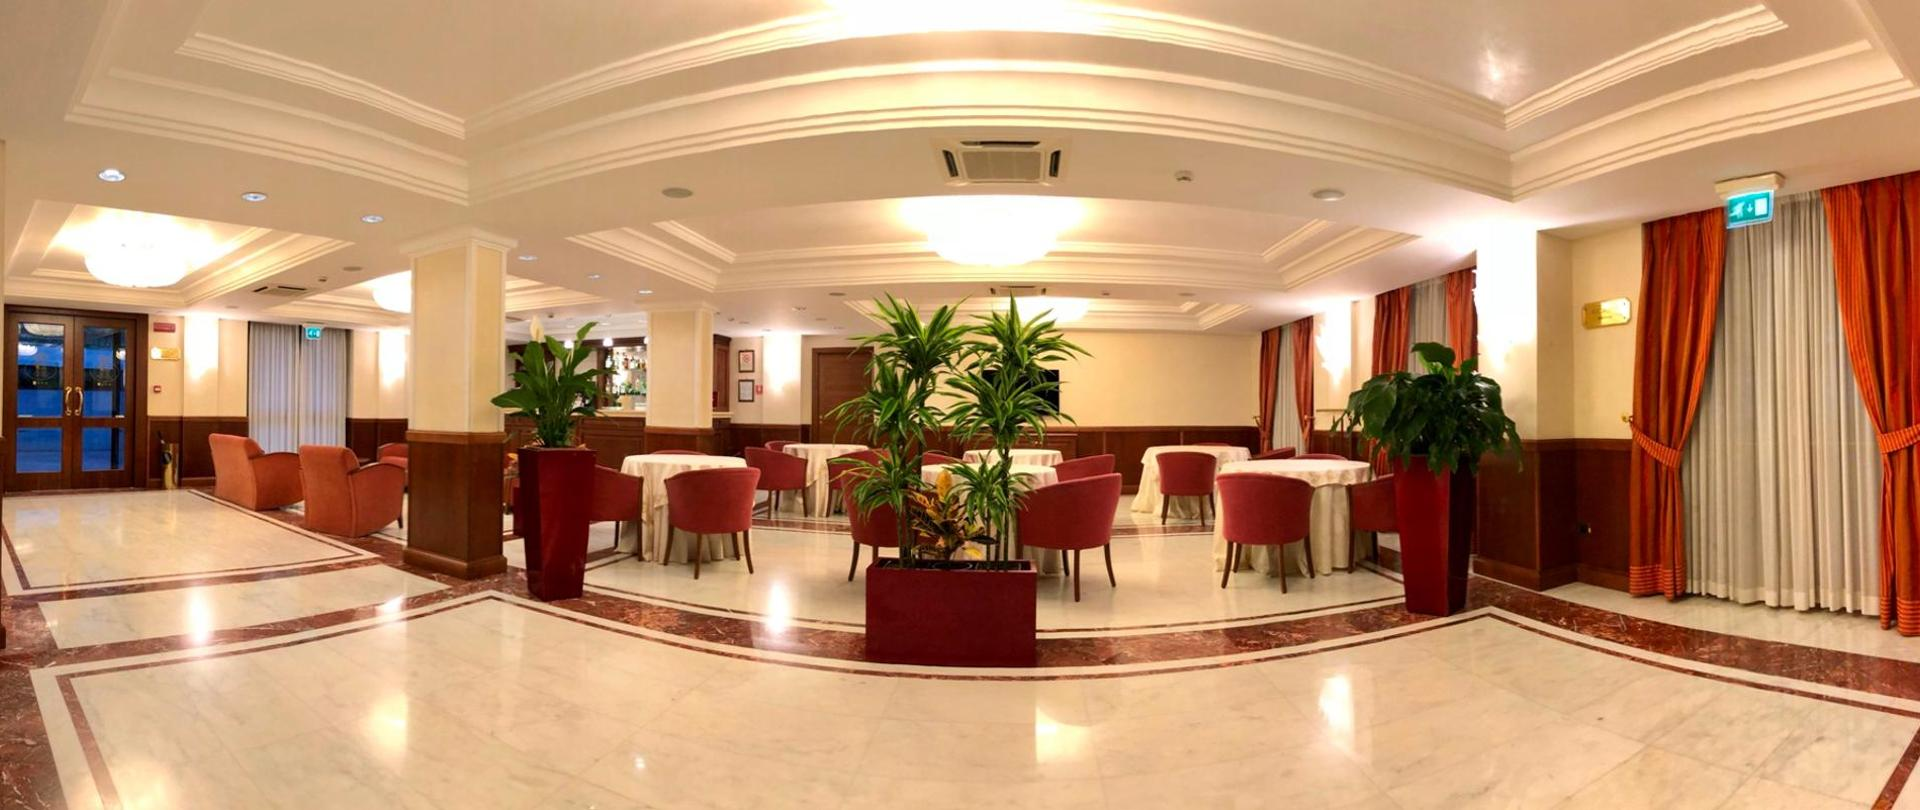 Hotel San Giovanni Rotondo